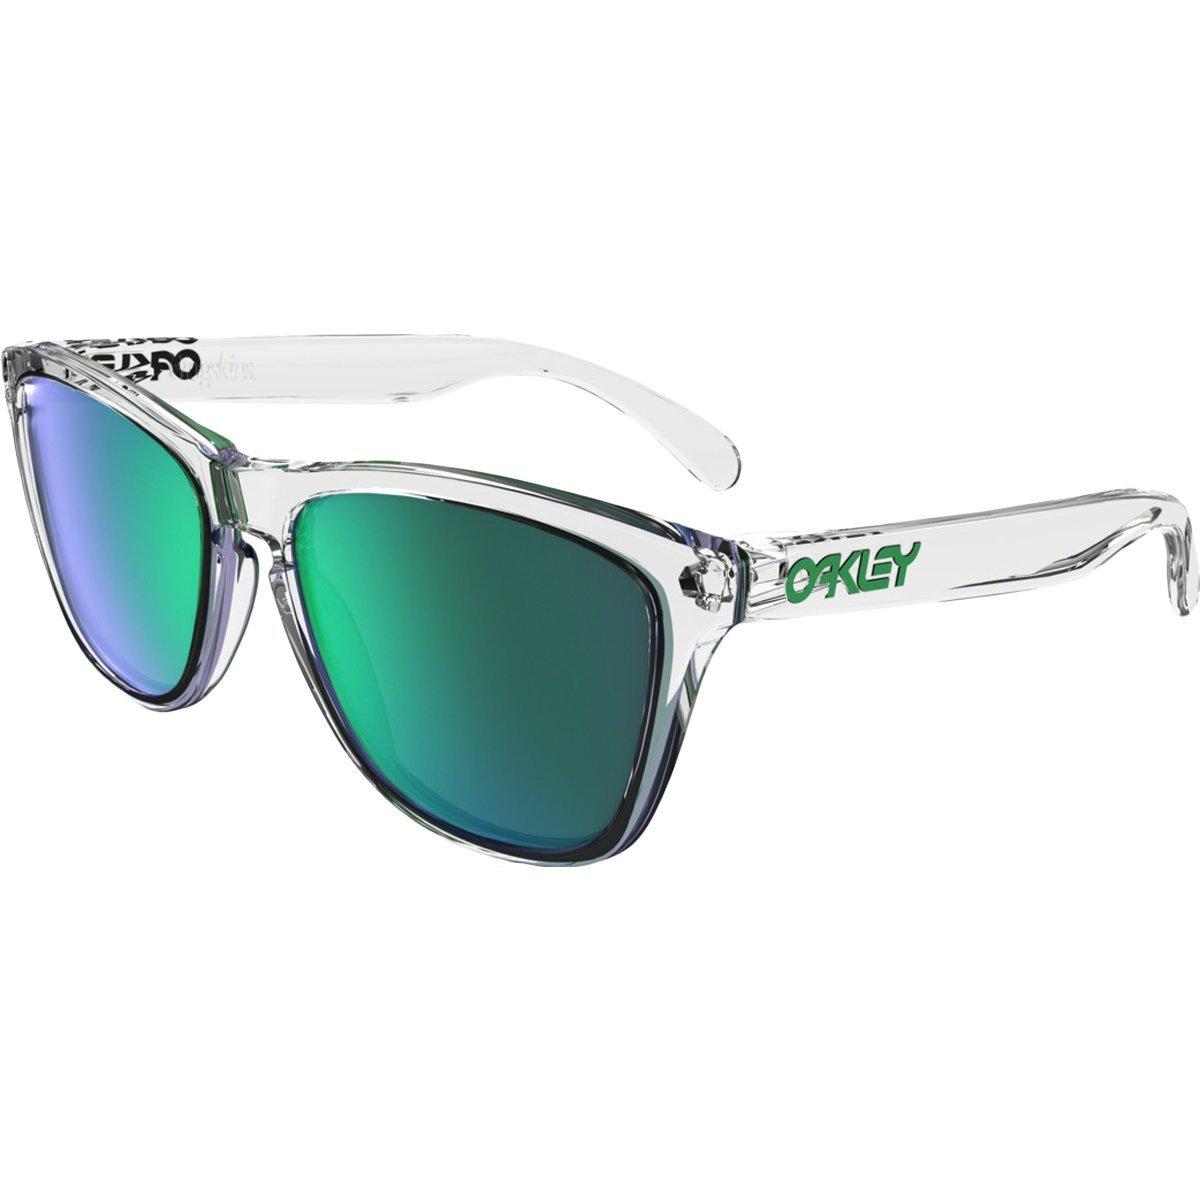 Oakley Frogskins 9013A3 Gafas de Sol, Polished Clear, 55 para Hombre